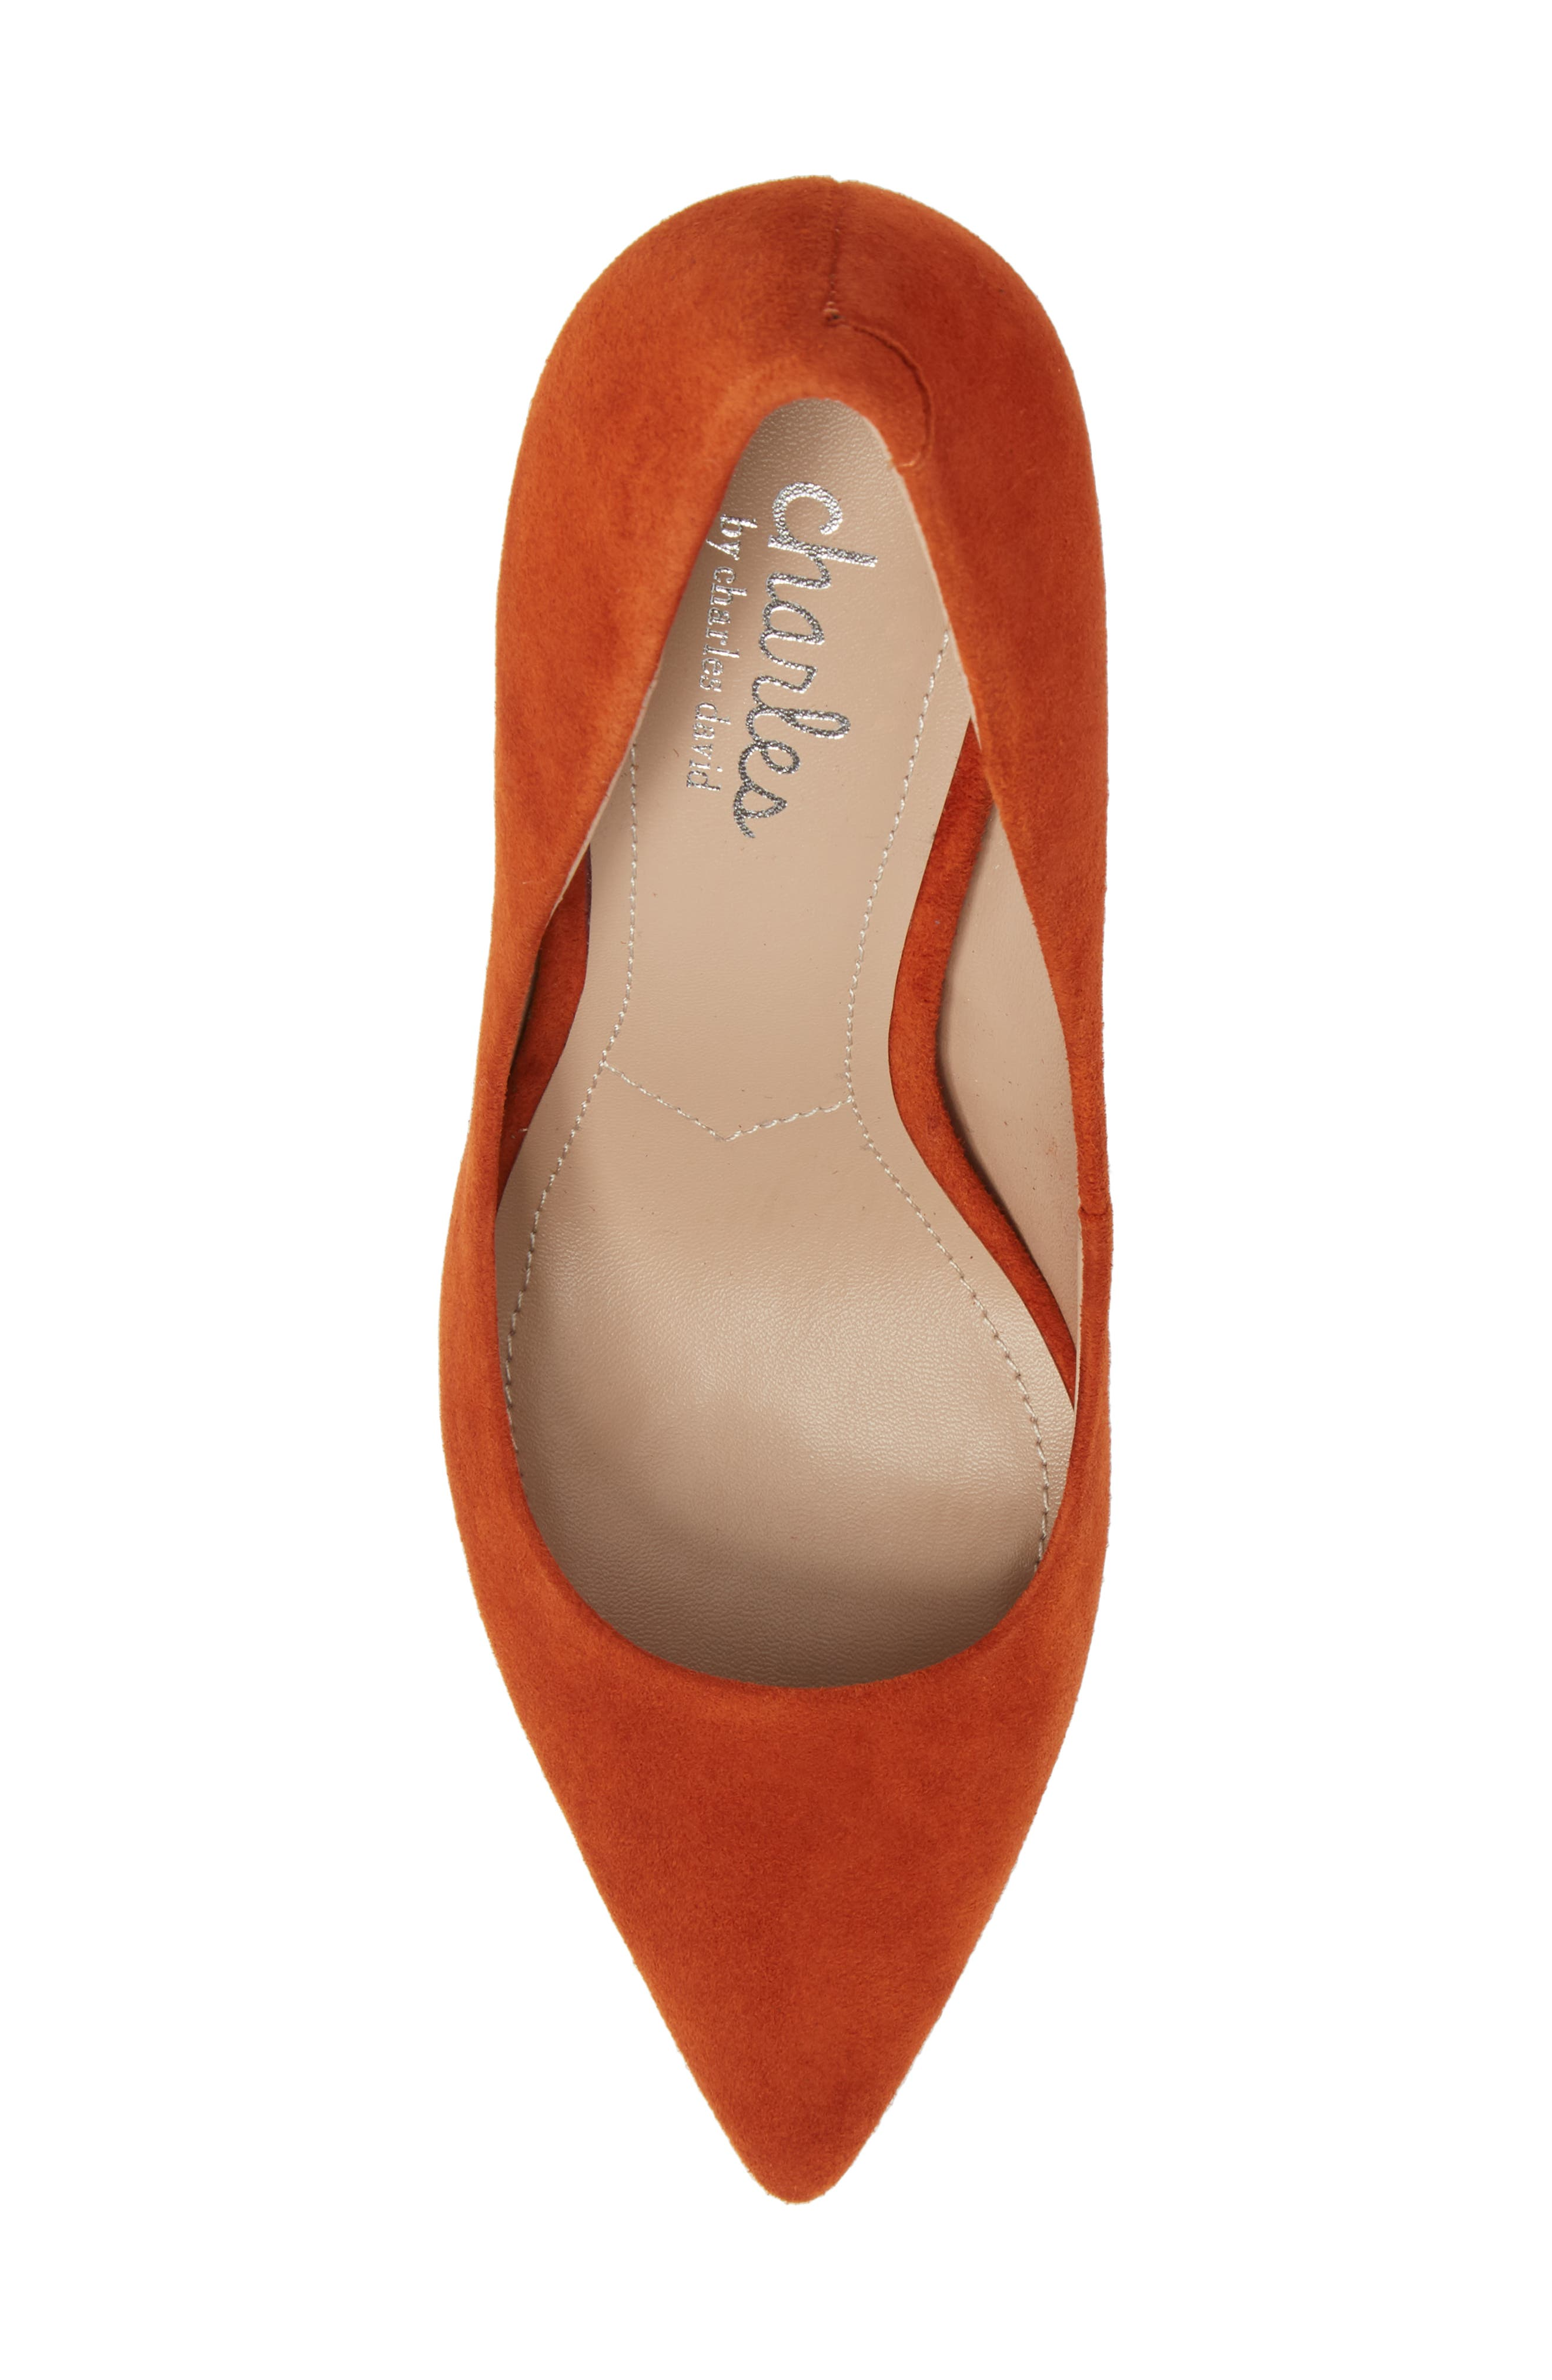 Maxx Pointy Toe Pump,                             Alternate thumbnail 4, color,                             Orange Suede